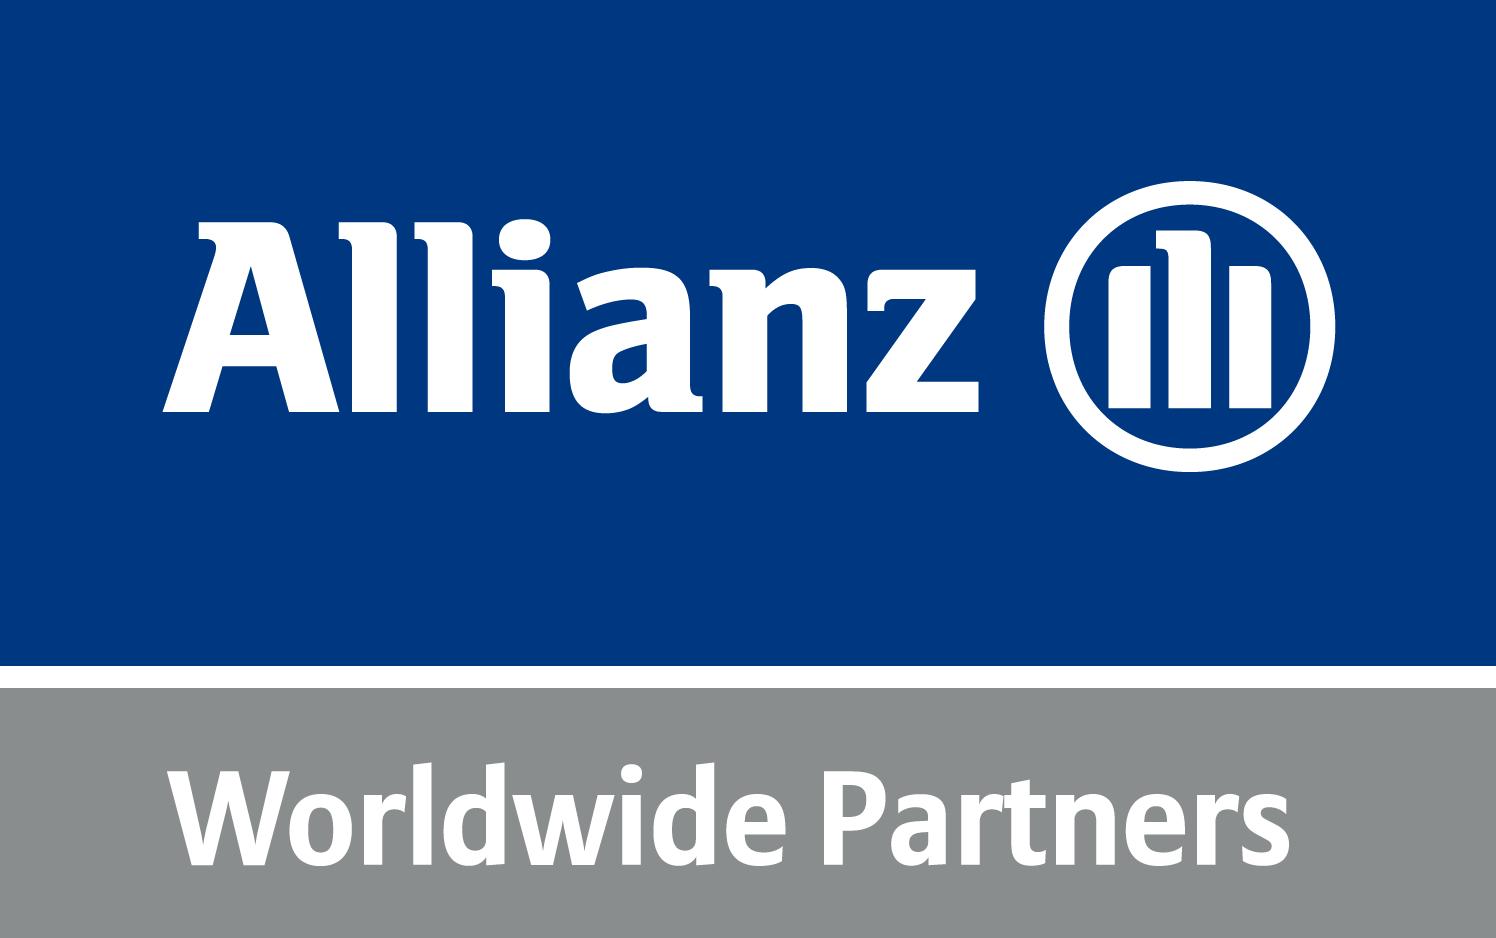 Allianz Worldwide Partners Logo